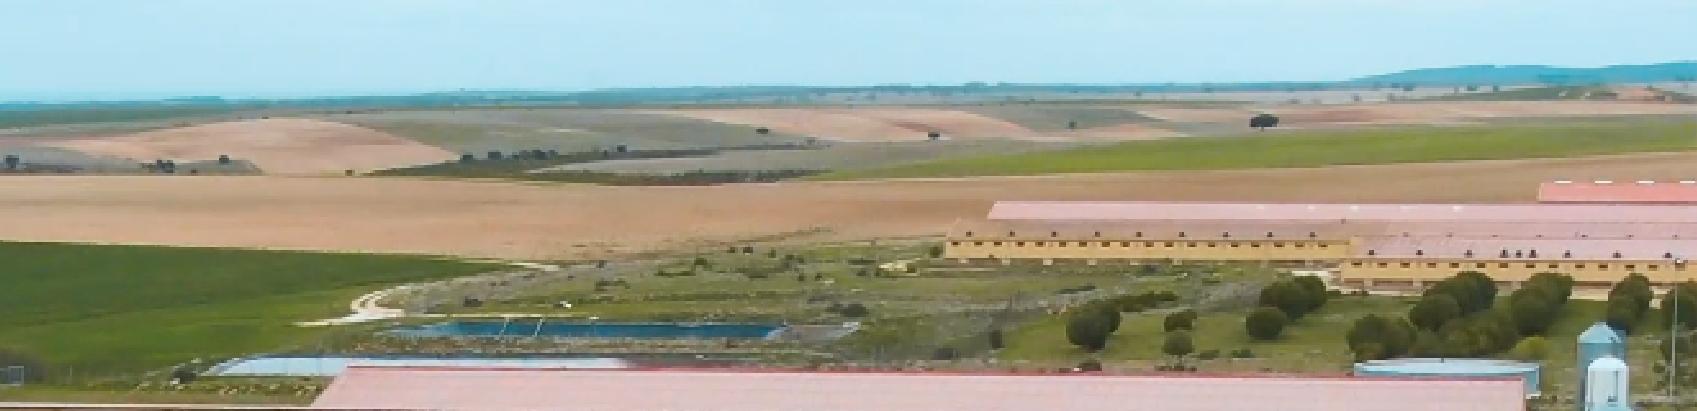 Granjas Duroc